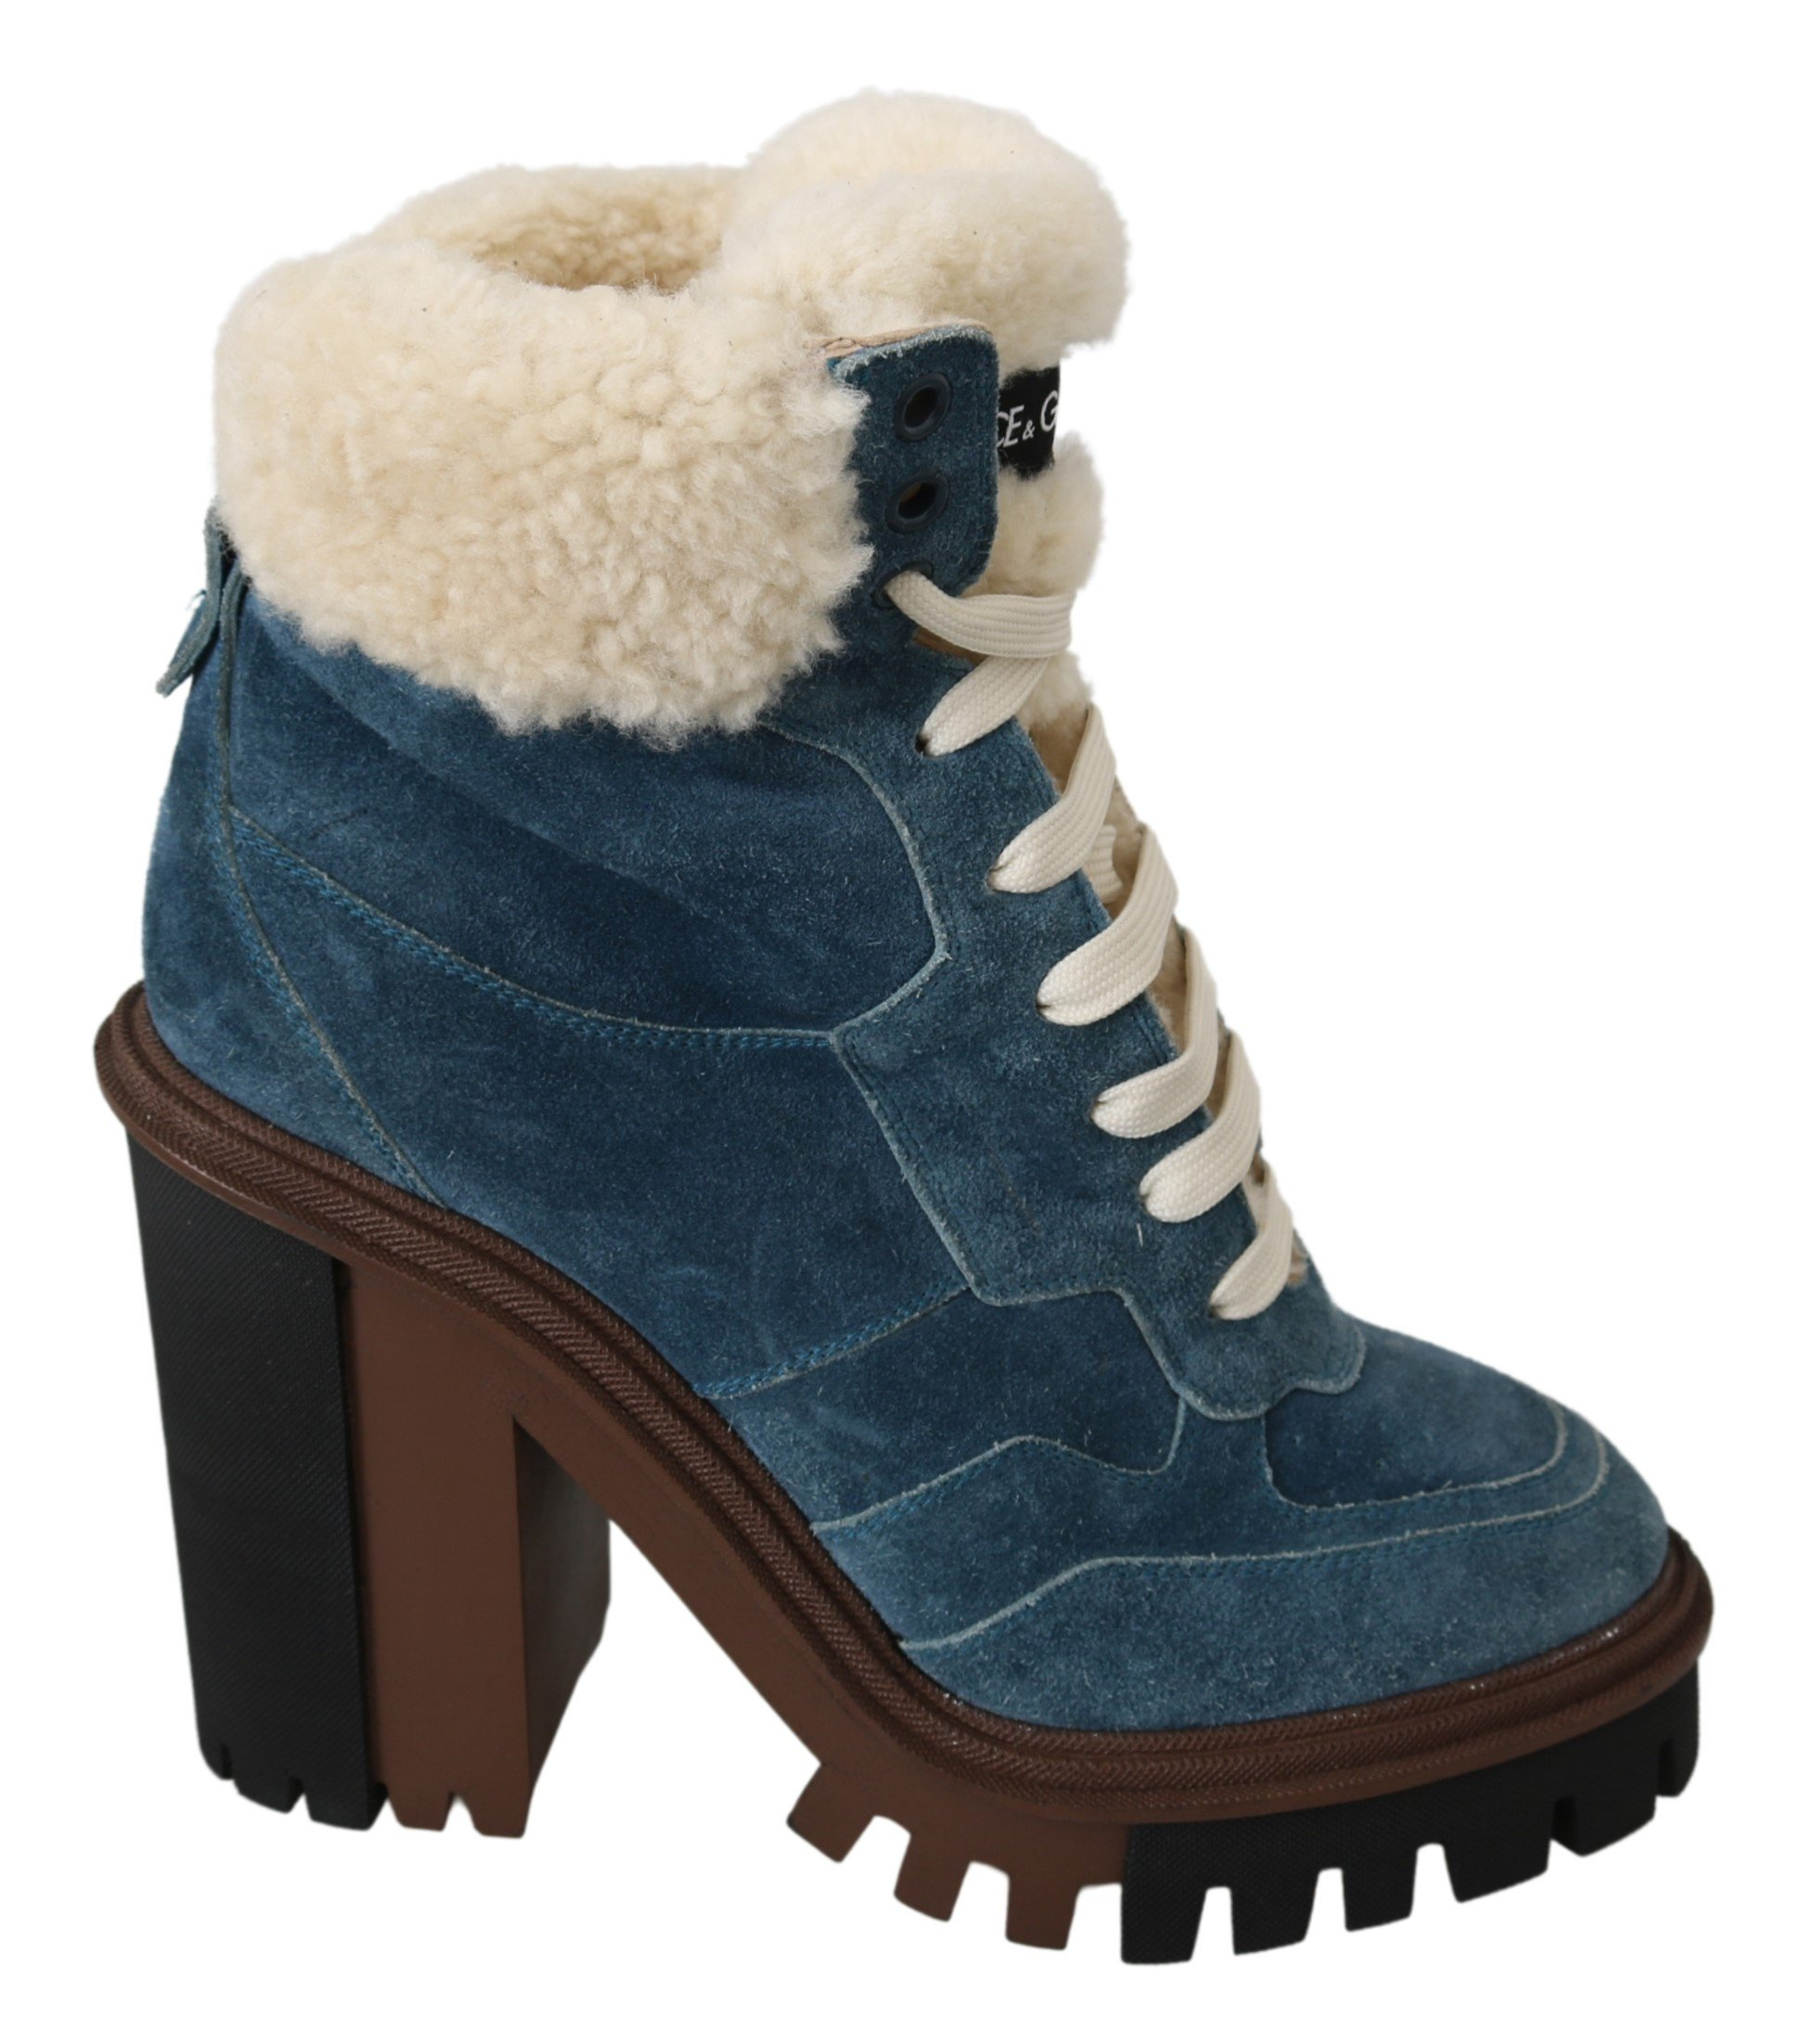 Dolce & Gabbana Women's Fur Shearling Ankle High Boot LA7062 - EU39/US8.5